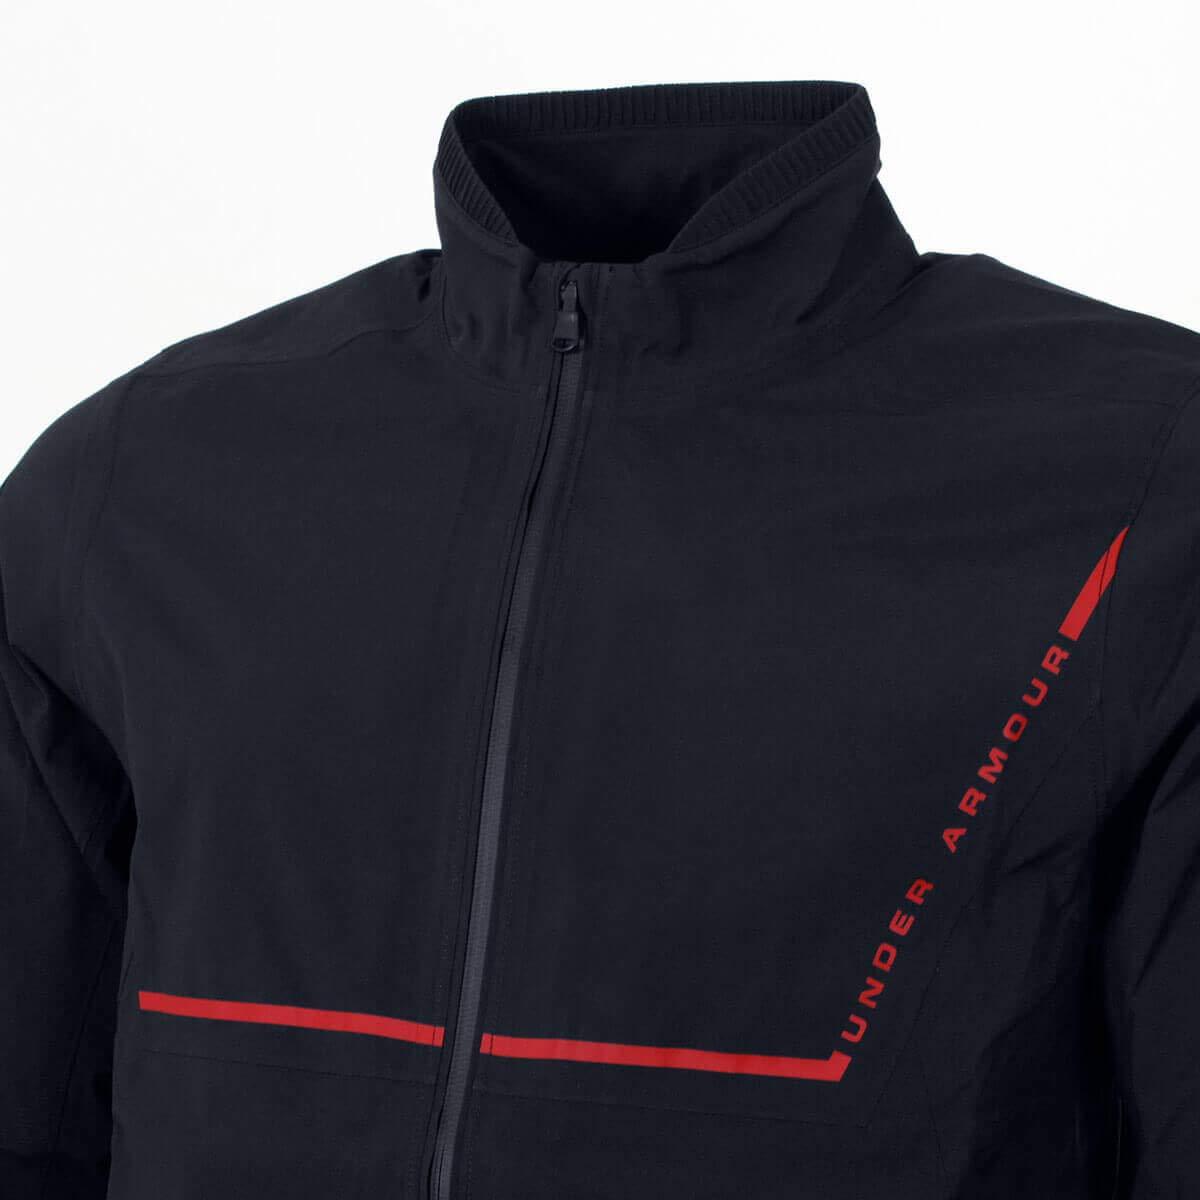 Under Armour Mens Storm GORE-TEX Paclite Full Zip Jacket